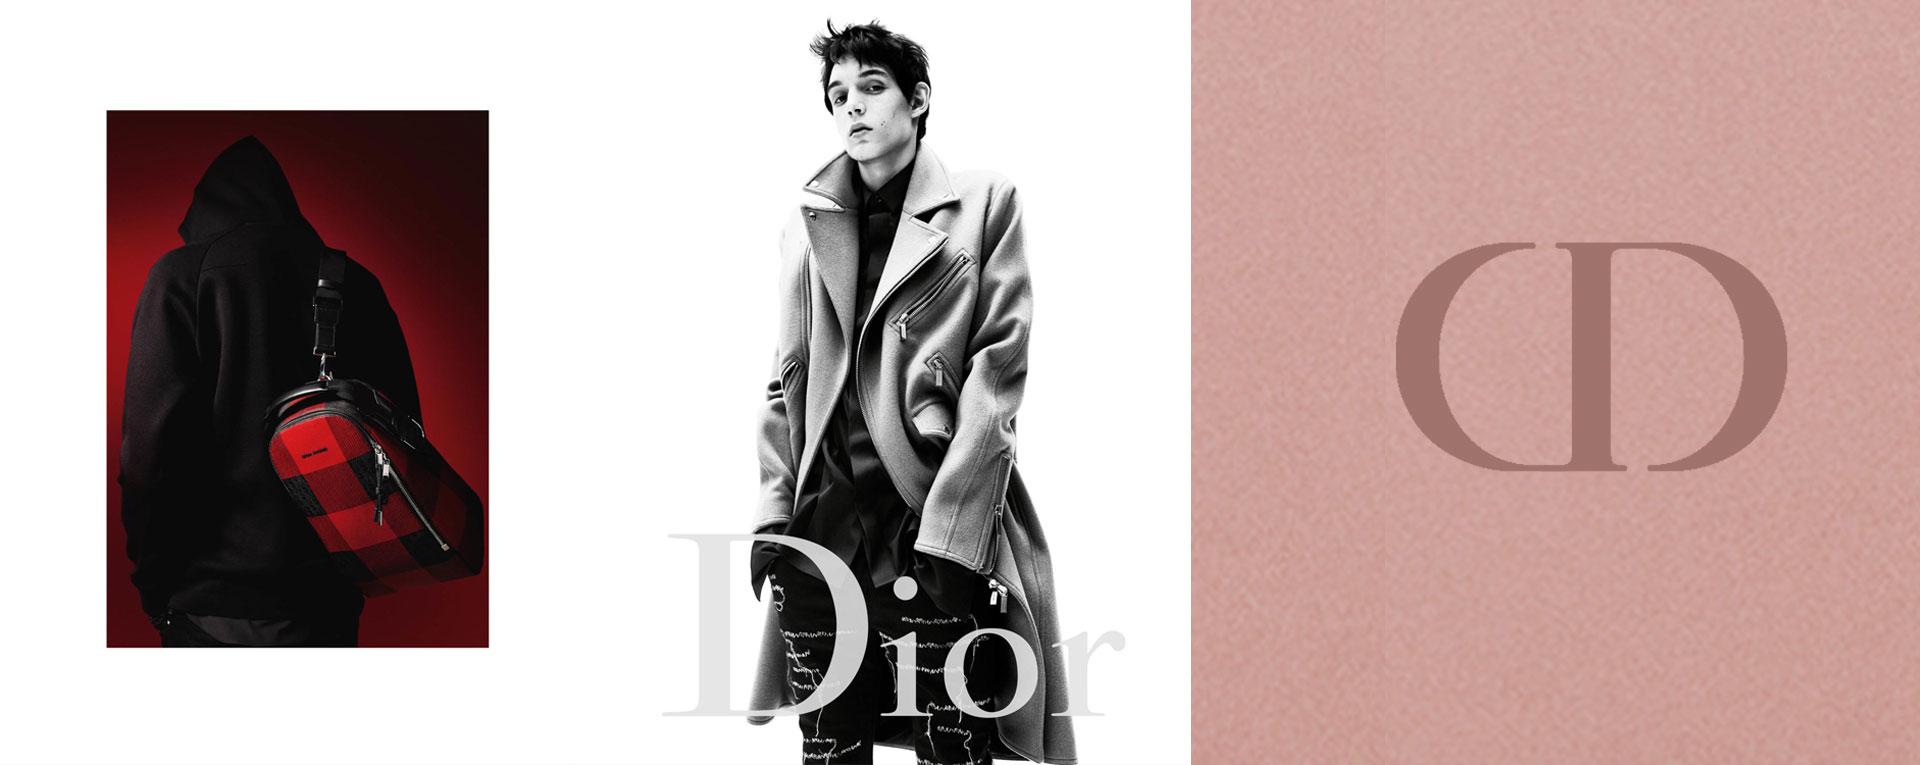 Dior 41 - دیور Dior